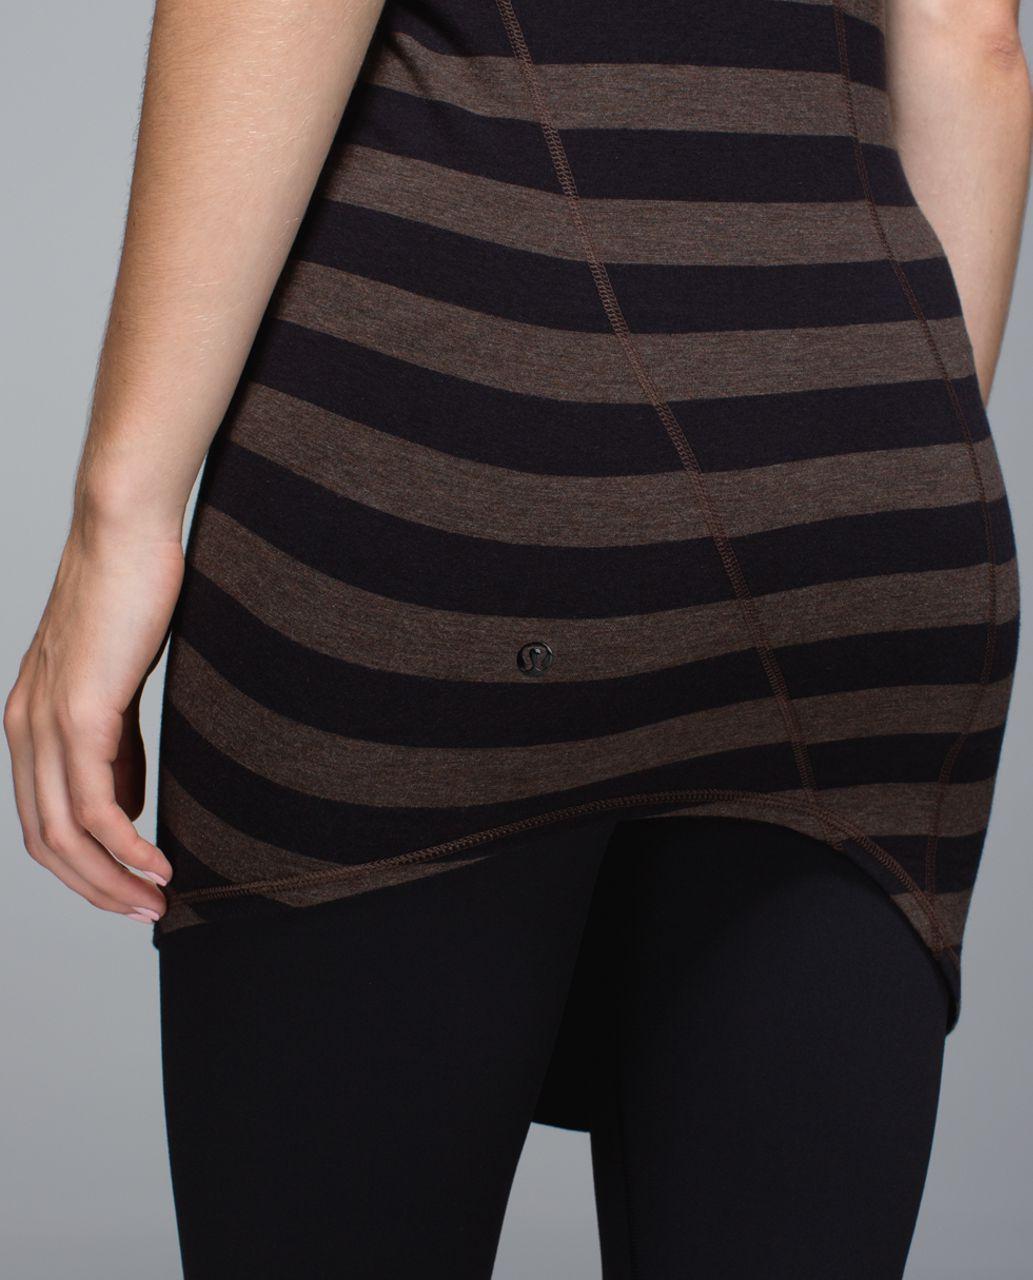 Lululemon Torque Tank - Cozy Stripe Black Heathered Bark Chocolate / Heathered Black Birdstooth Black Dip Dye